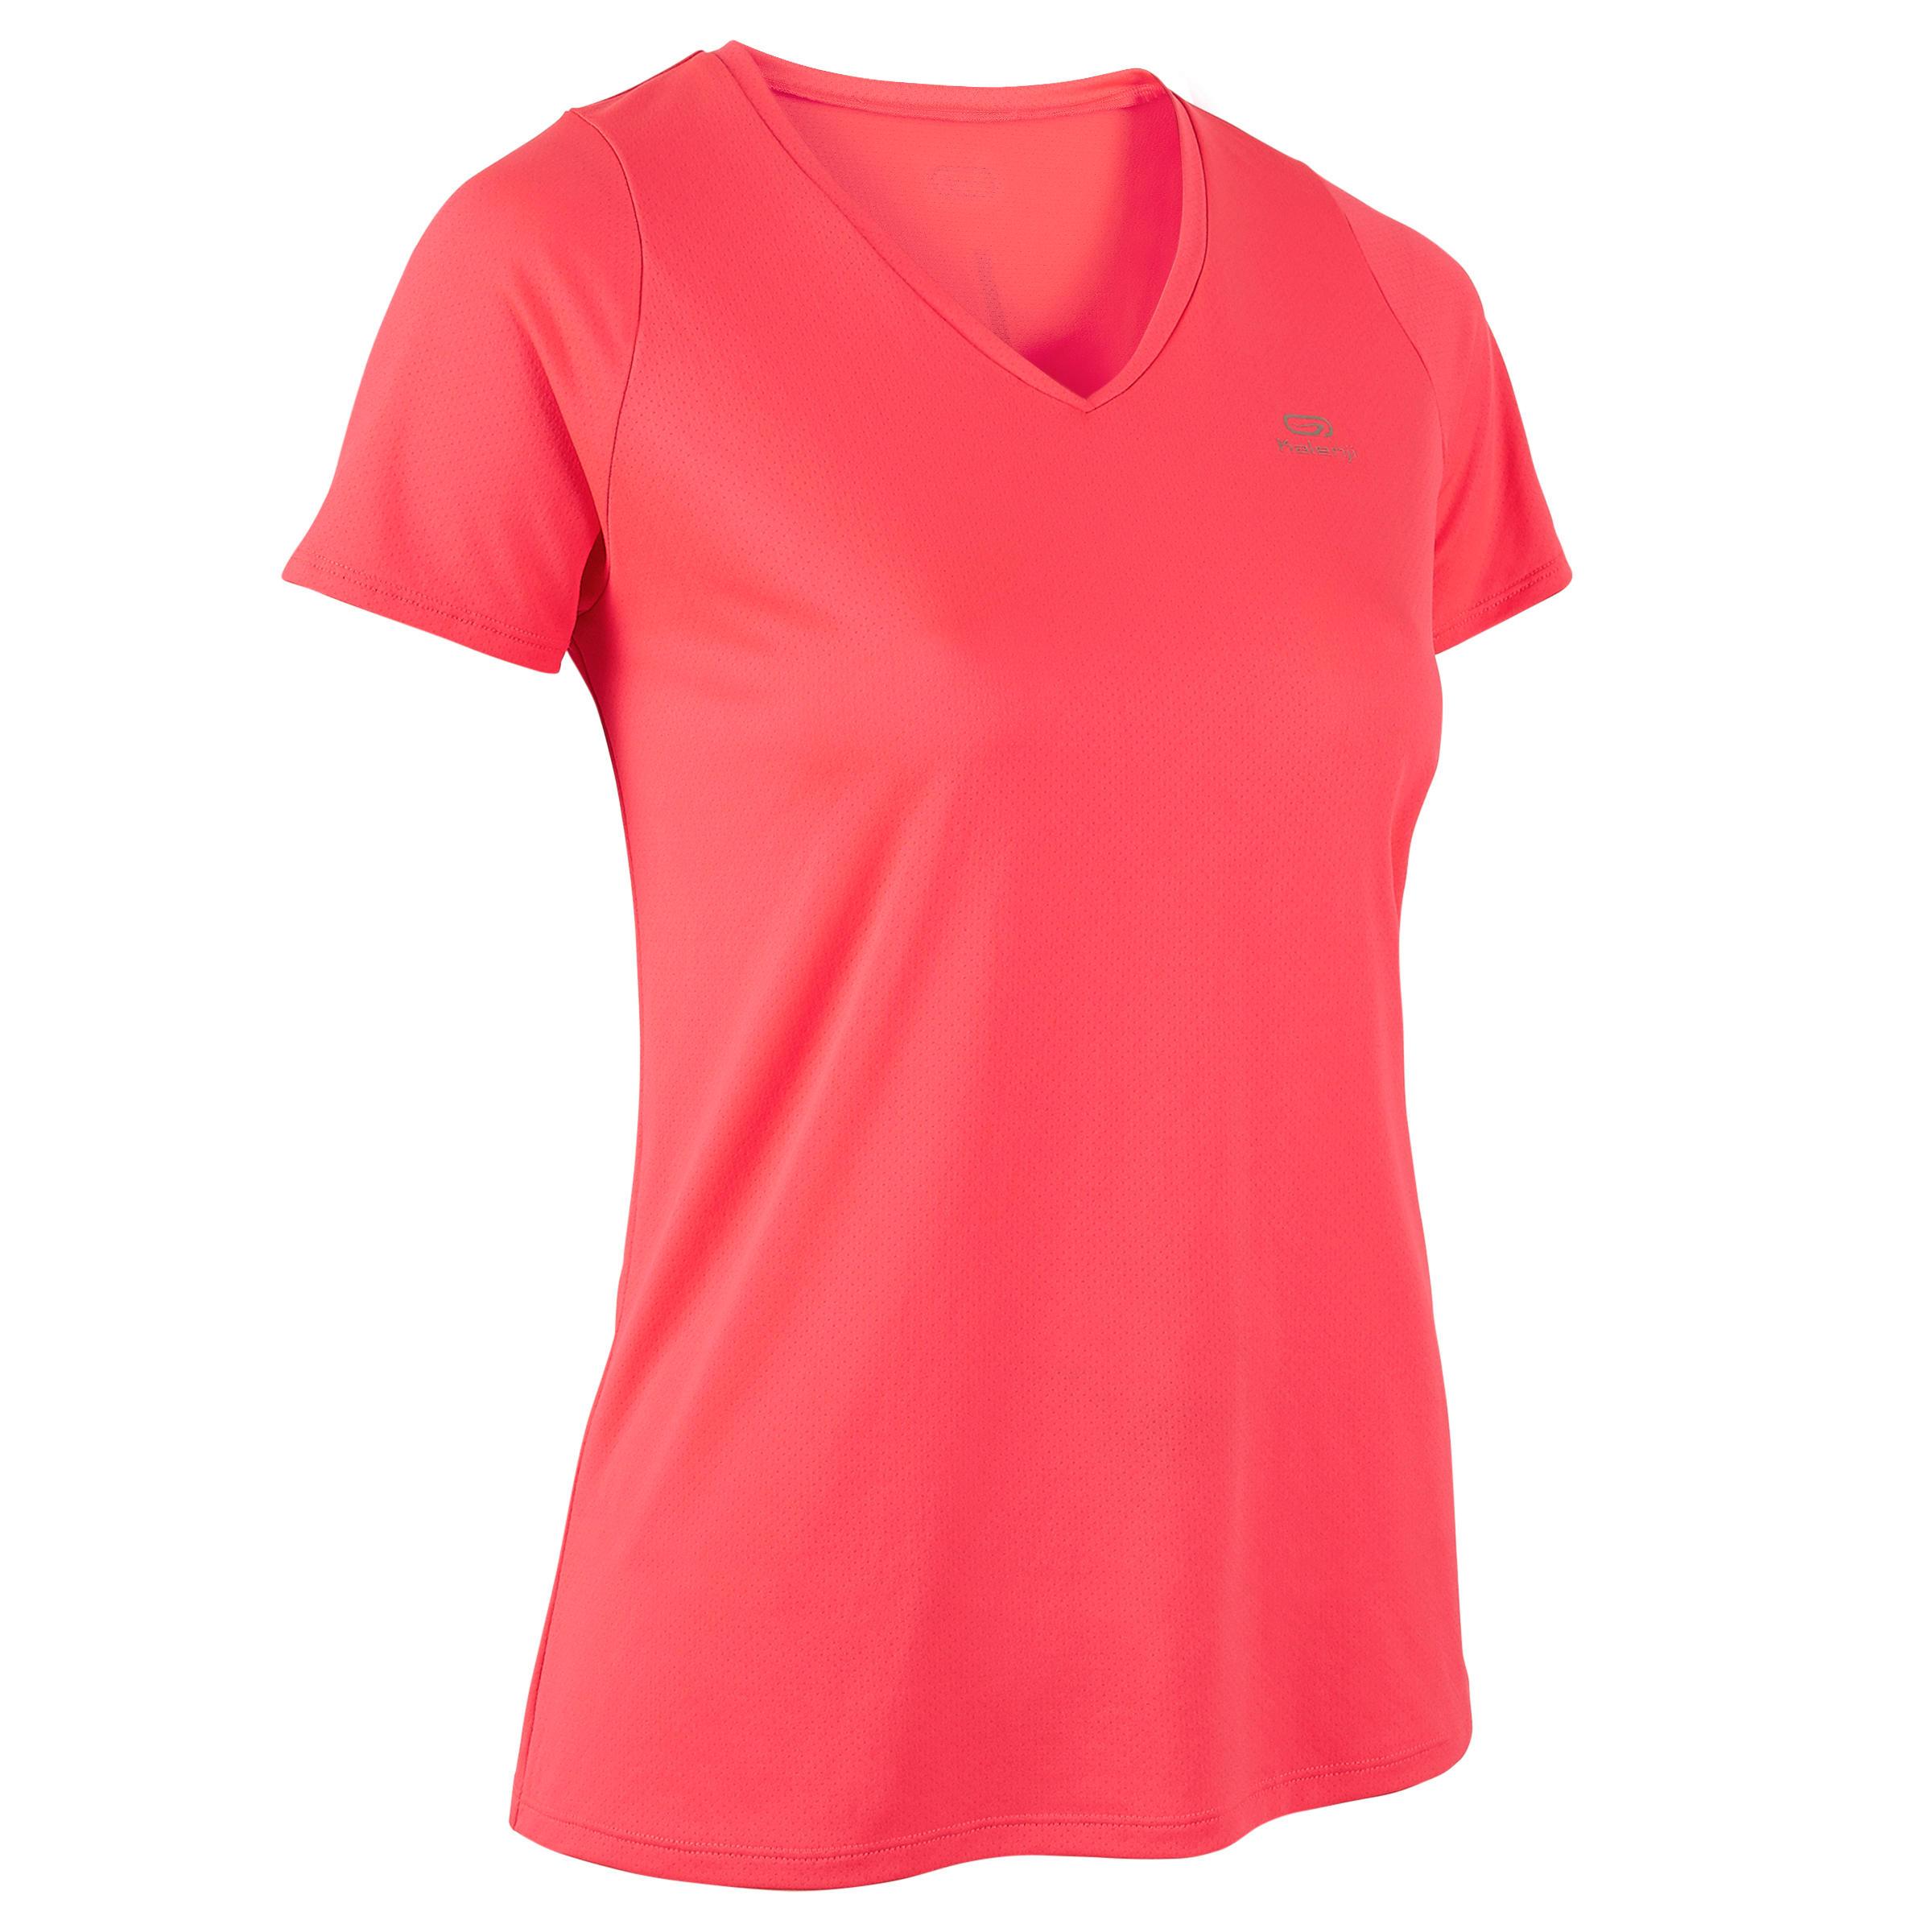 Laufshirt kurzarm Run Dry Damen koralle | Sportbekleidung > Sportshirts | Rot - Rosa | Kalenji